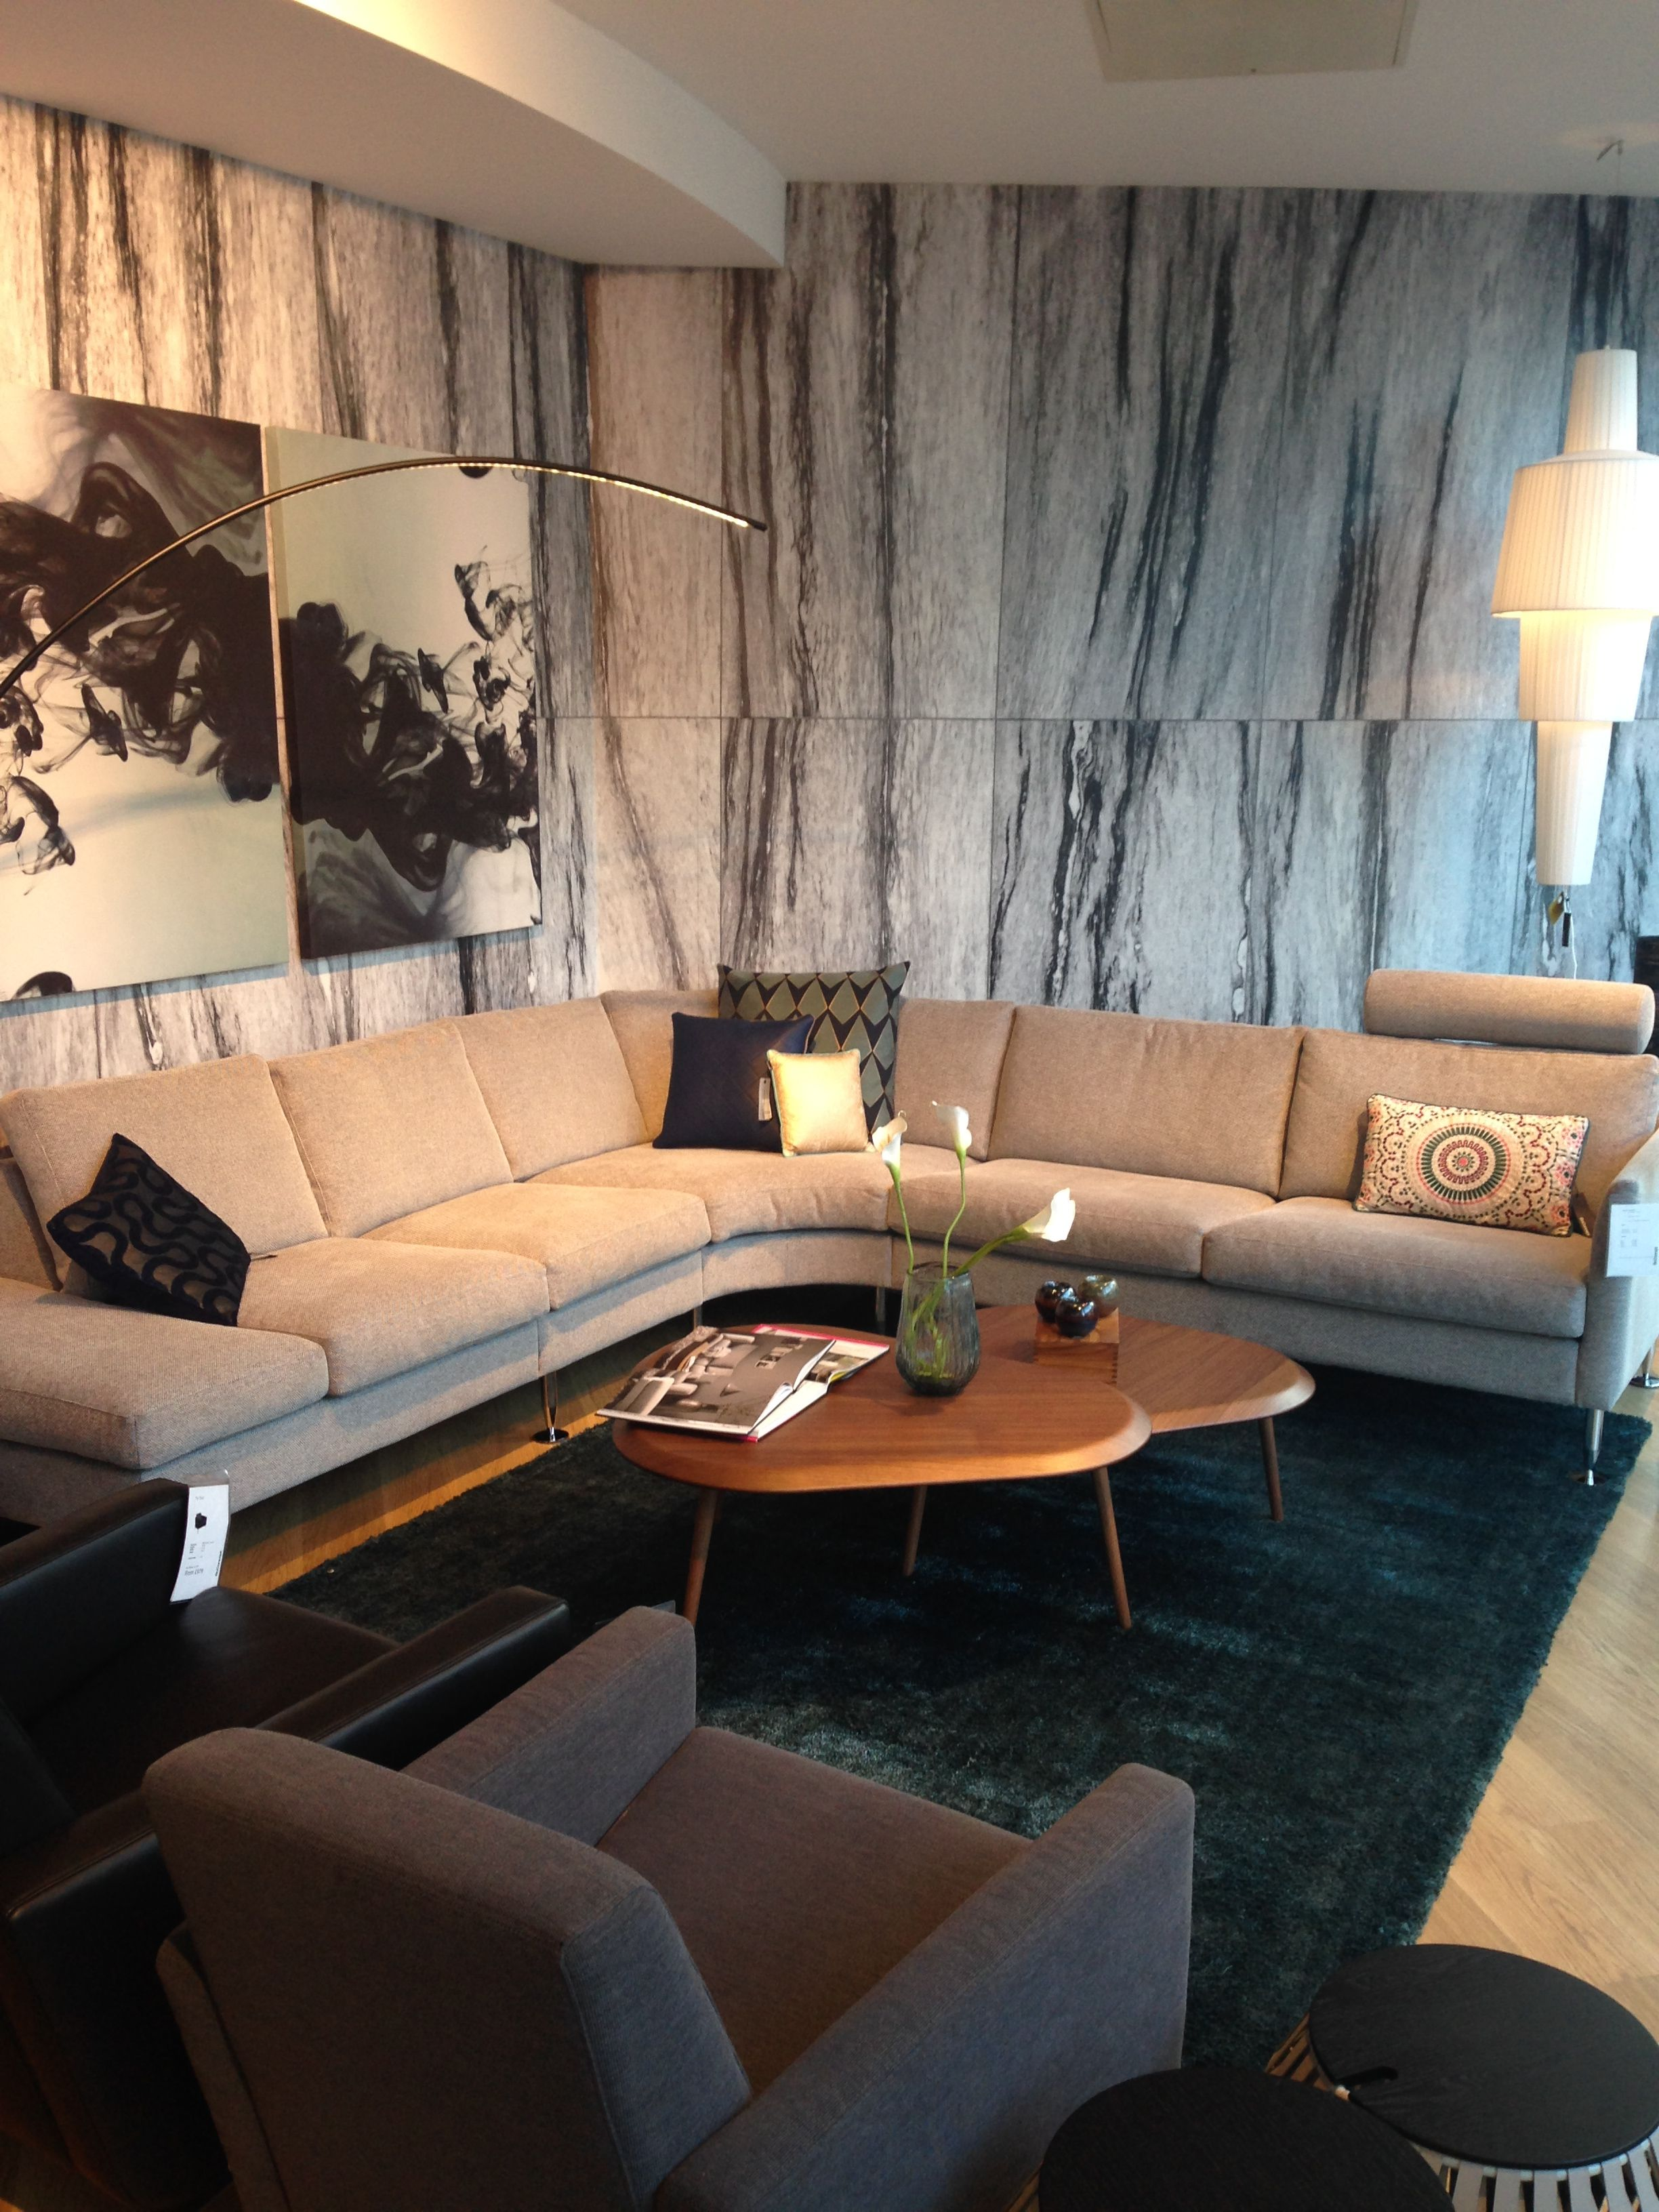 Modular Living Room Furniture Uk Indivi 2 Ultimate Modular Sofa System 10 Different Leg Designs